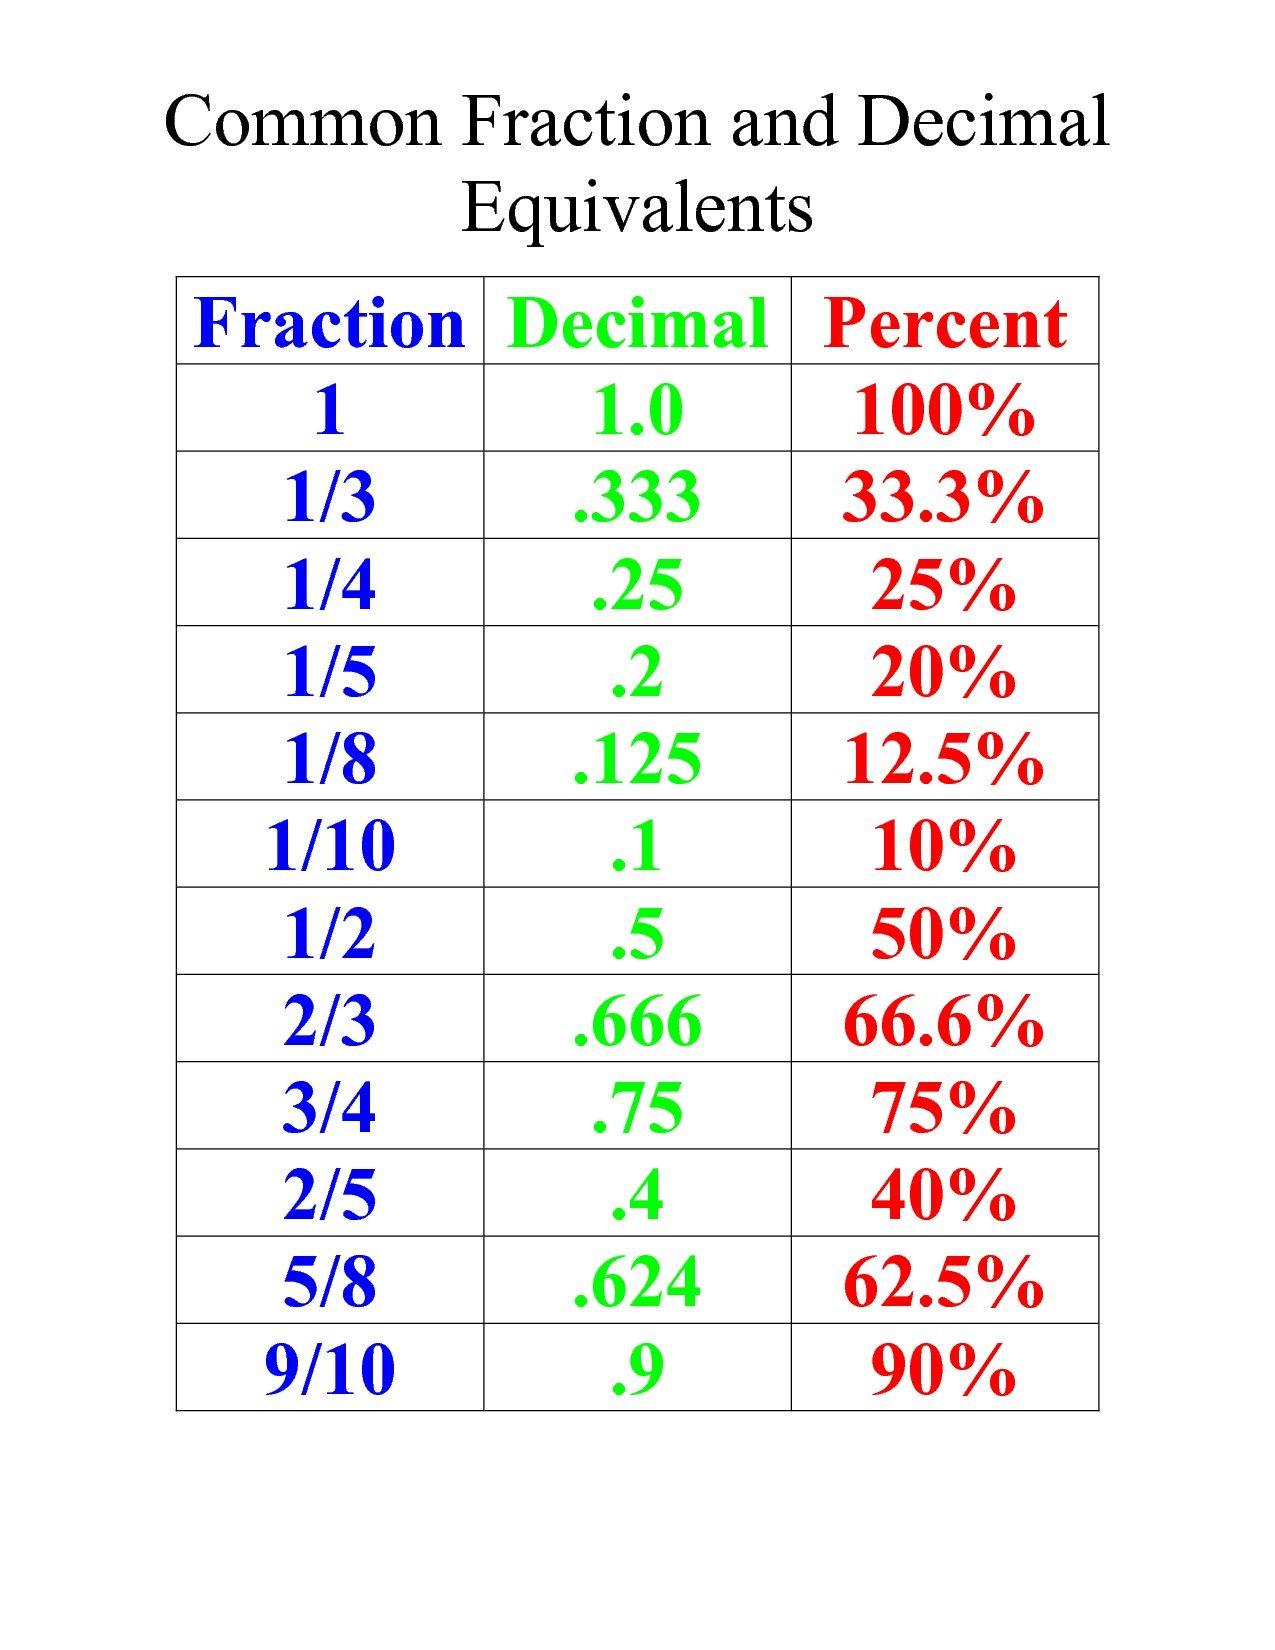 12 Memorable Converting Fractions To Decimals Worksheet 5th Grade In 2020 Fractions Decimals Percents Fractions Decimals Fractions